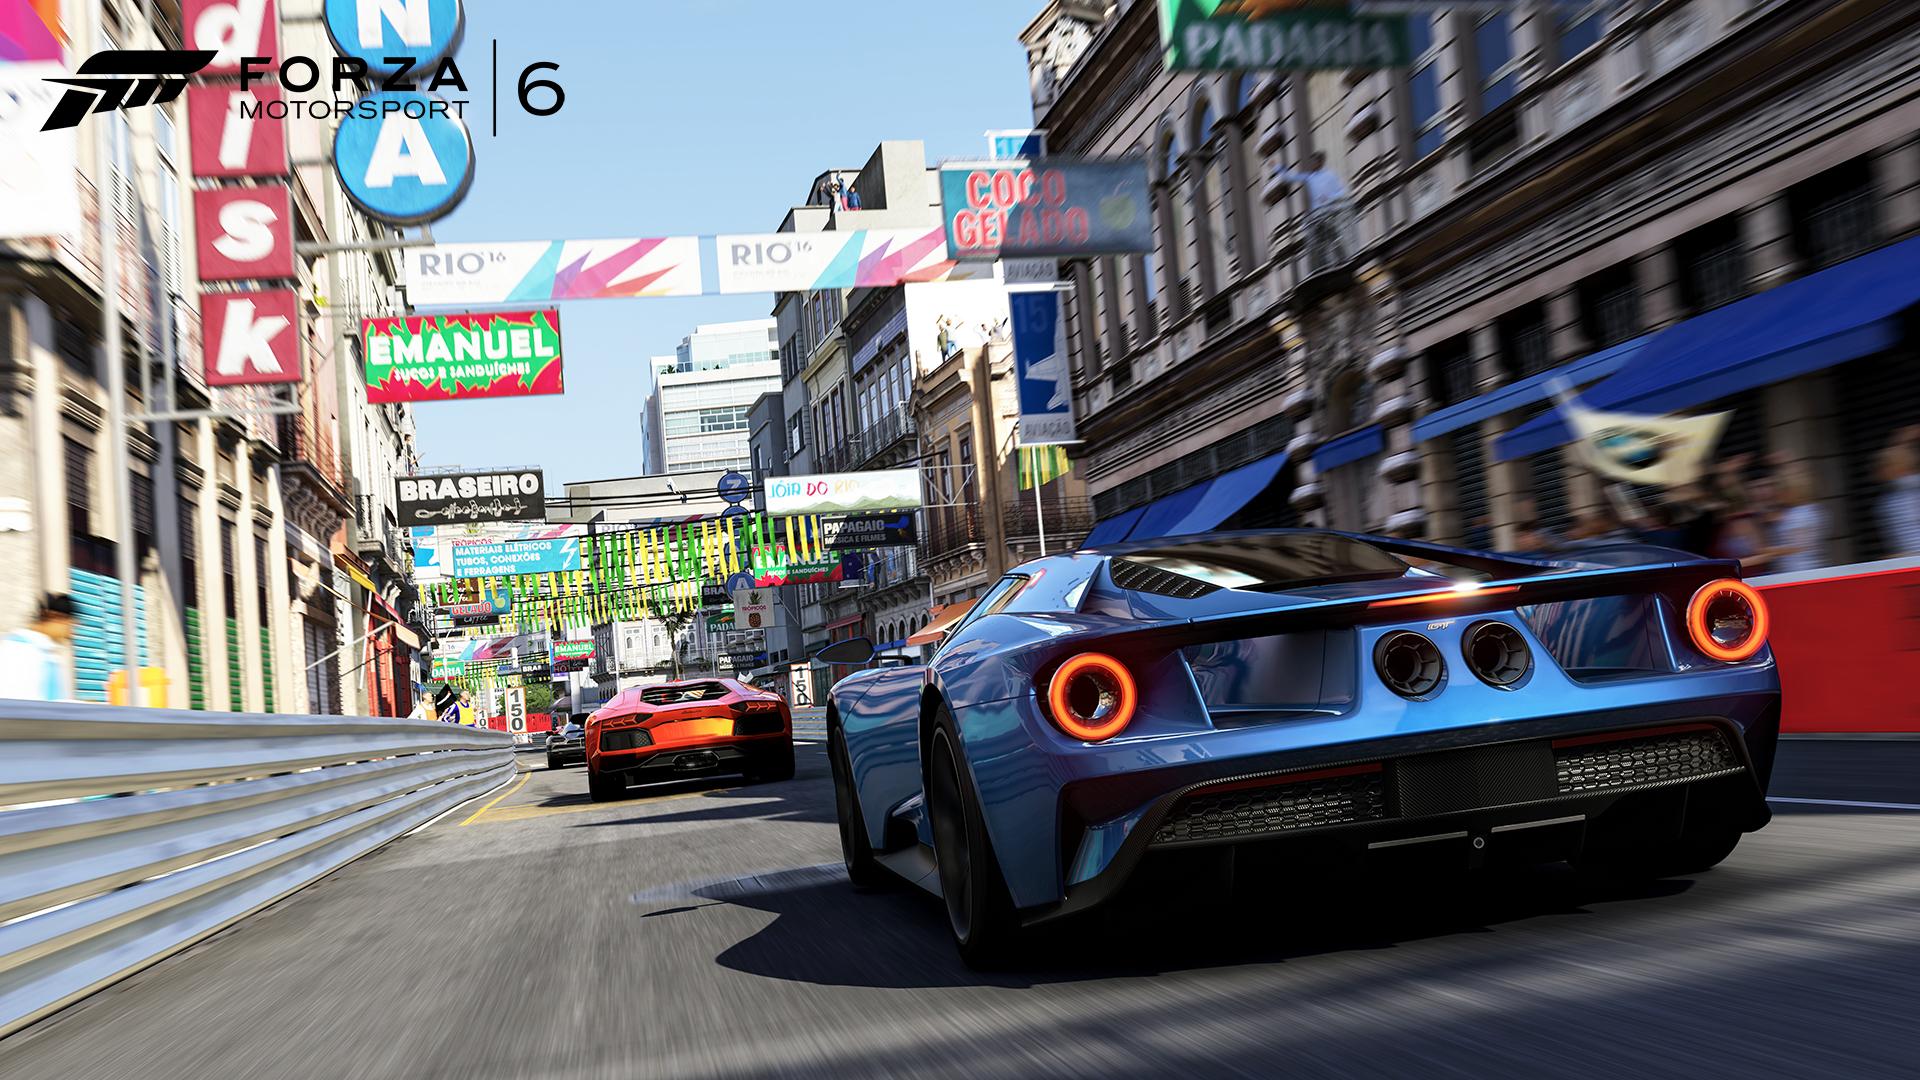 Forza Motorsport 6 - location Rio